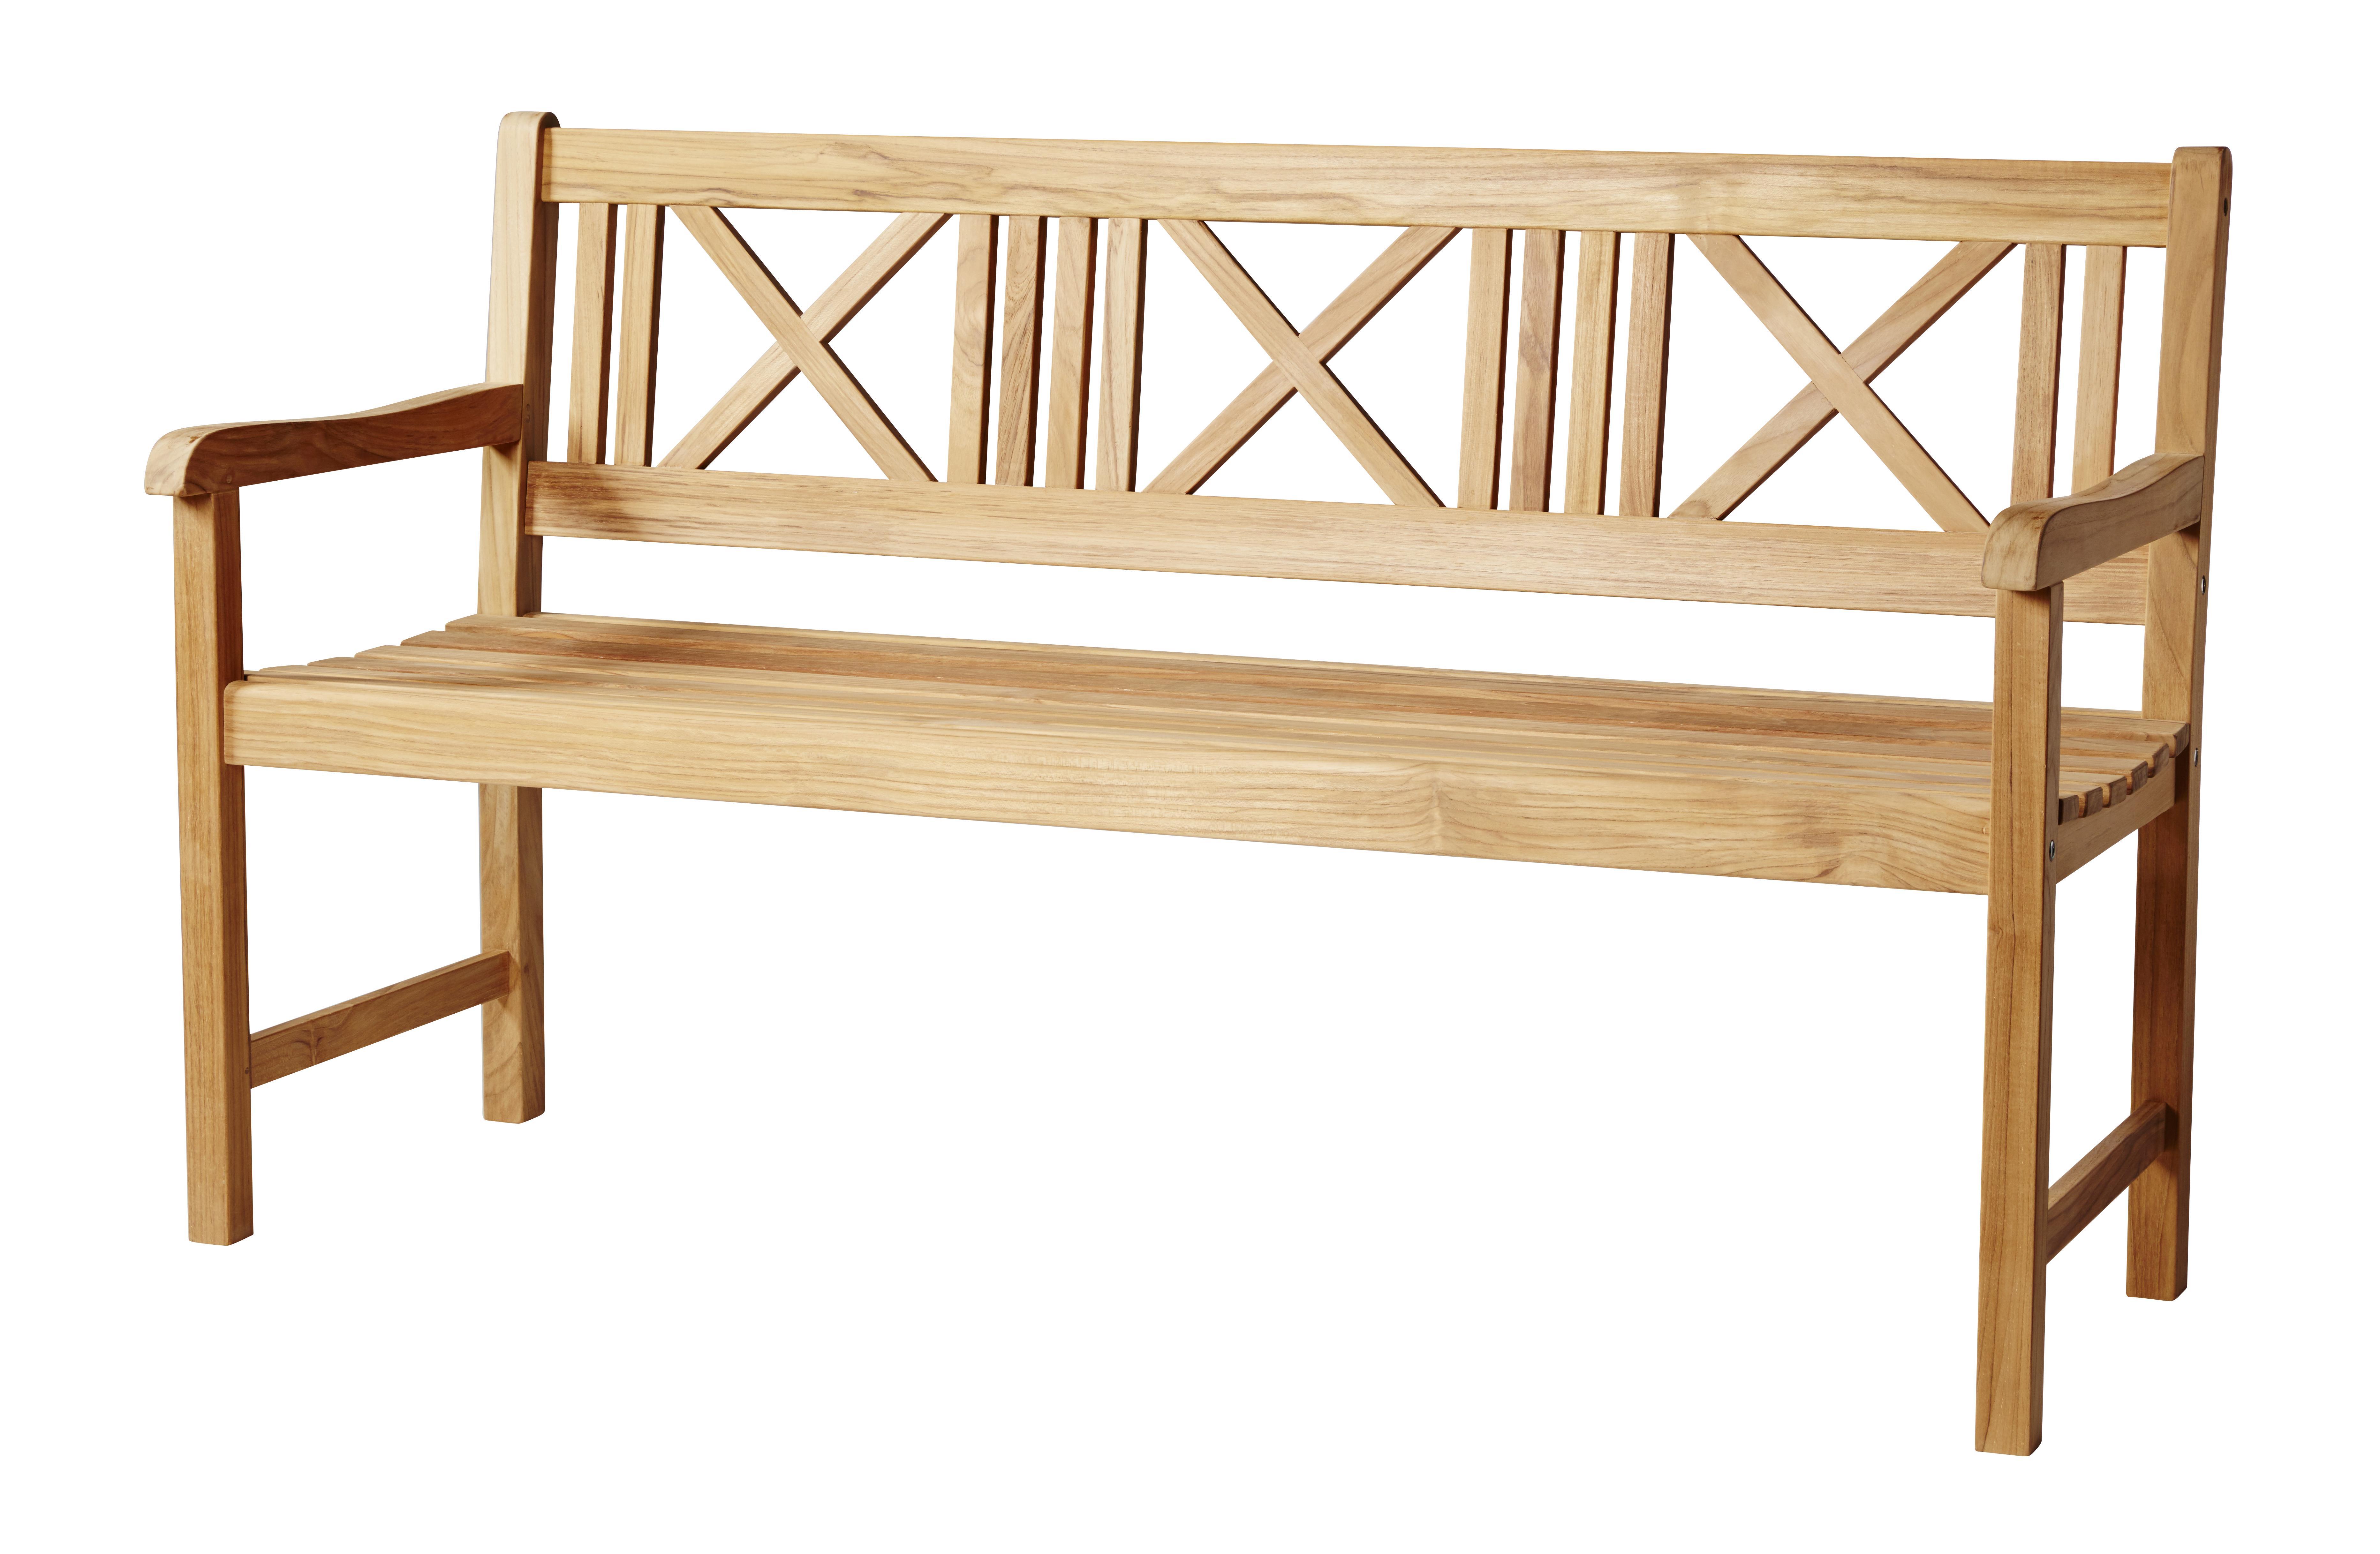 Plank 150 Cm.Cinas Rosenborg Bench 150 Cm Teak 4501000